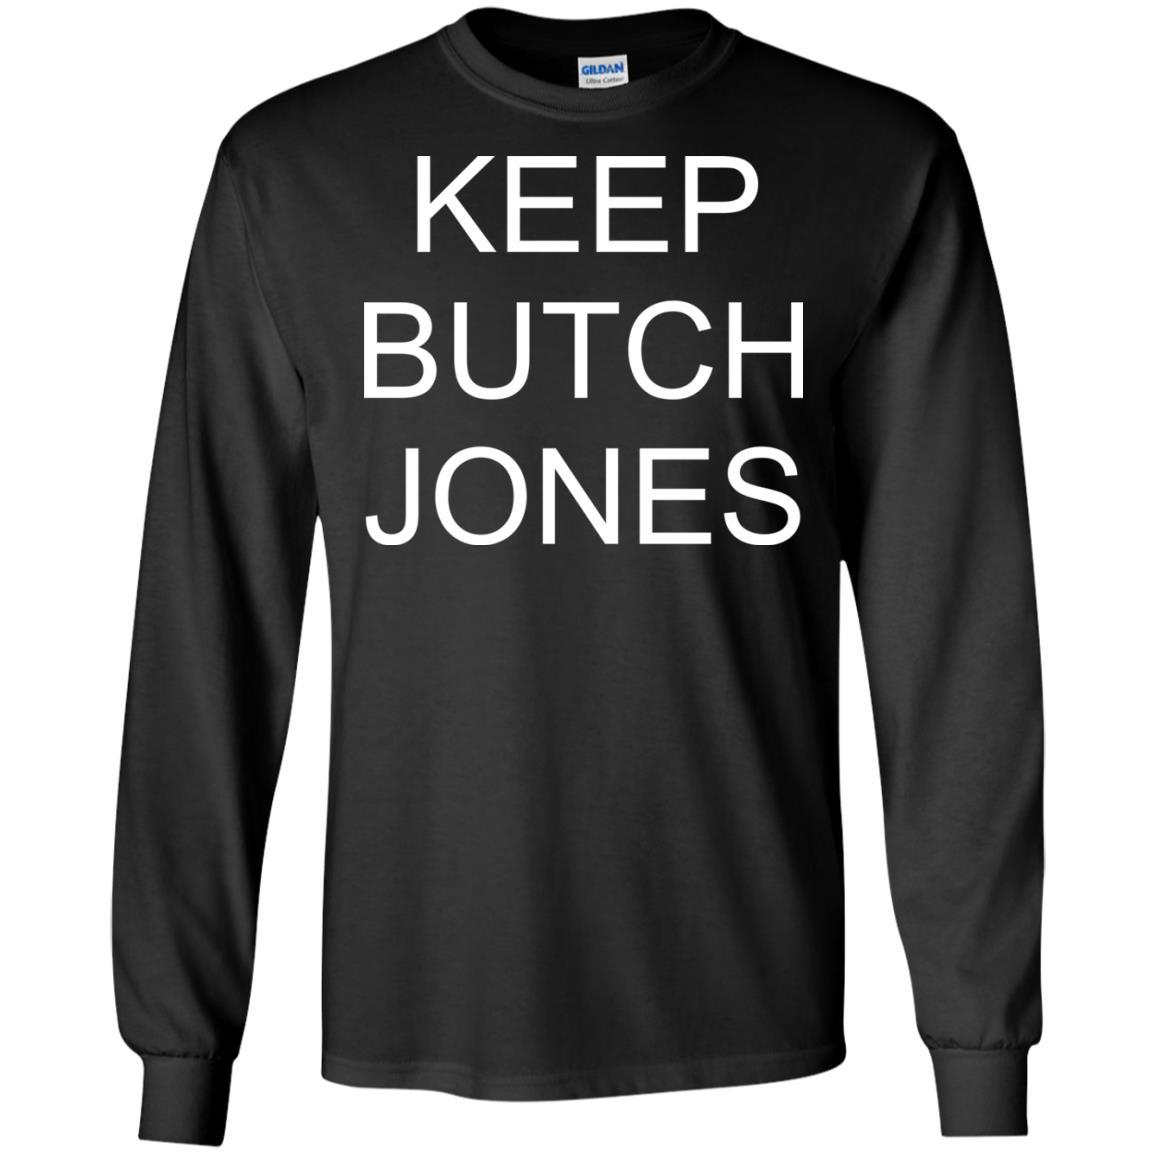 image 1431 - Keep Butch Jones shirt, sweater, long sleeve